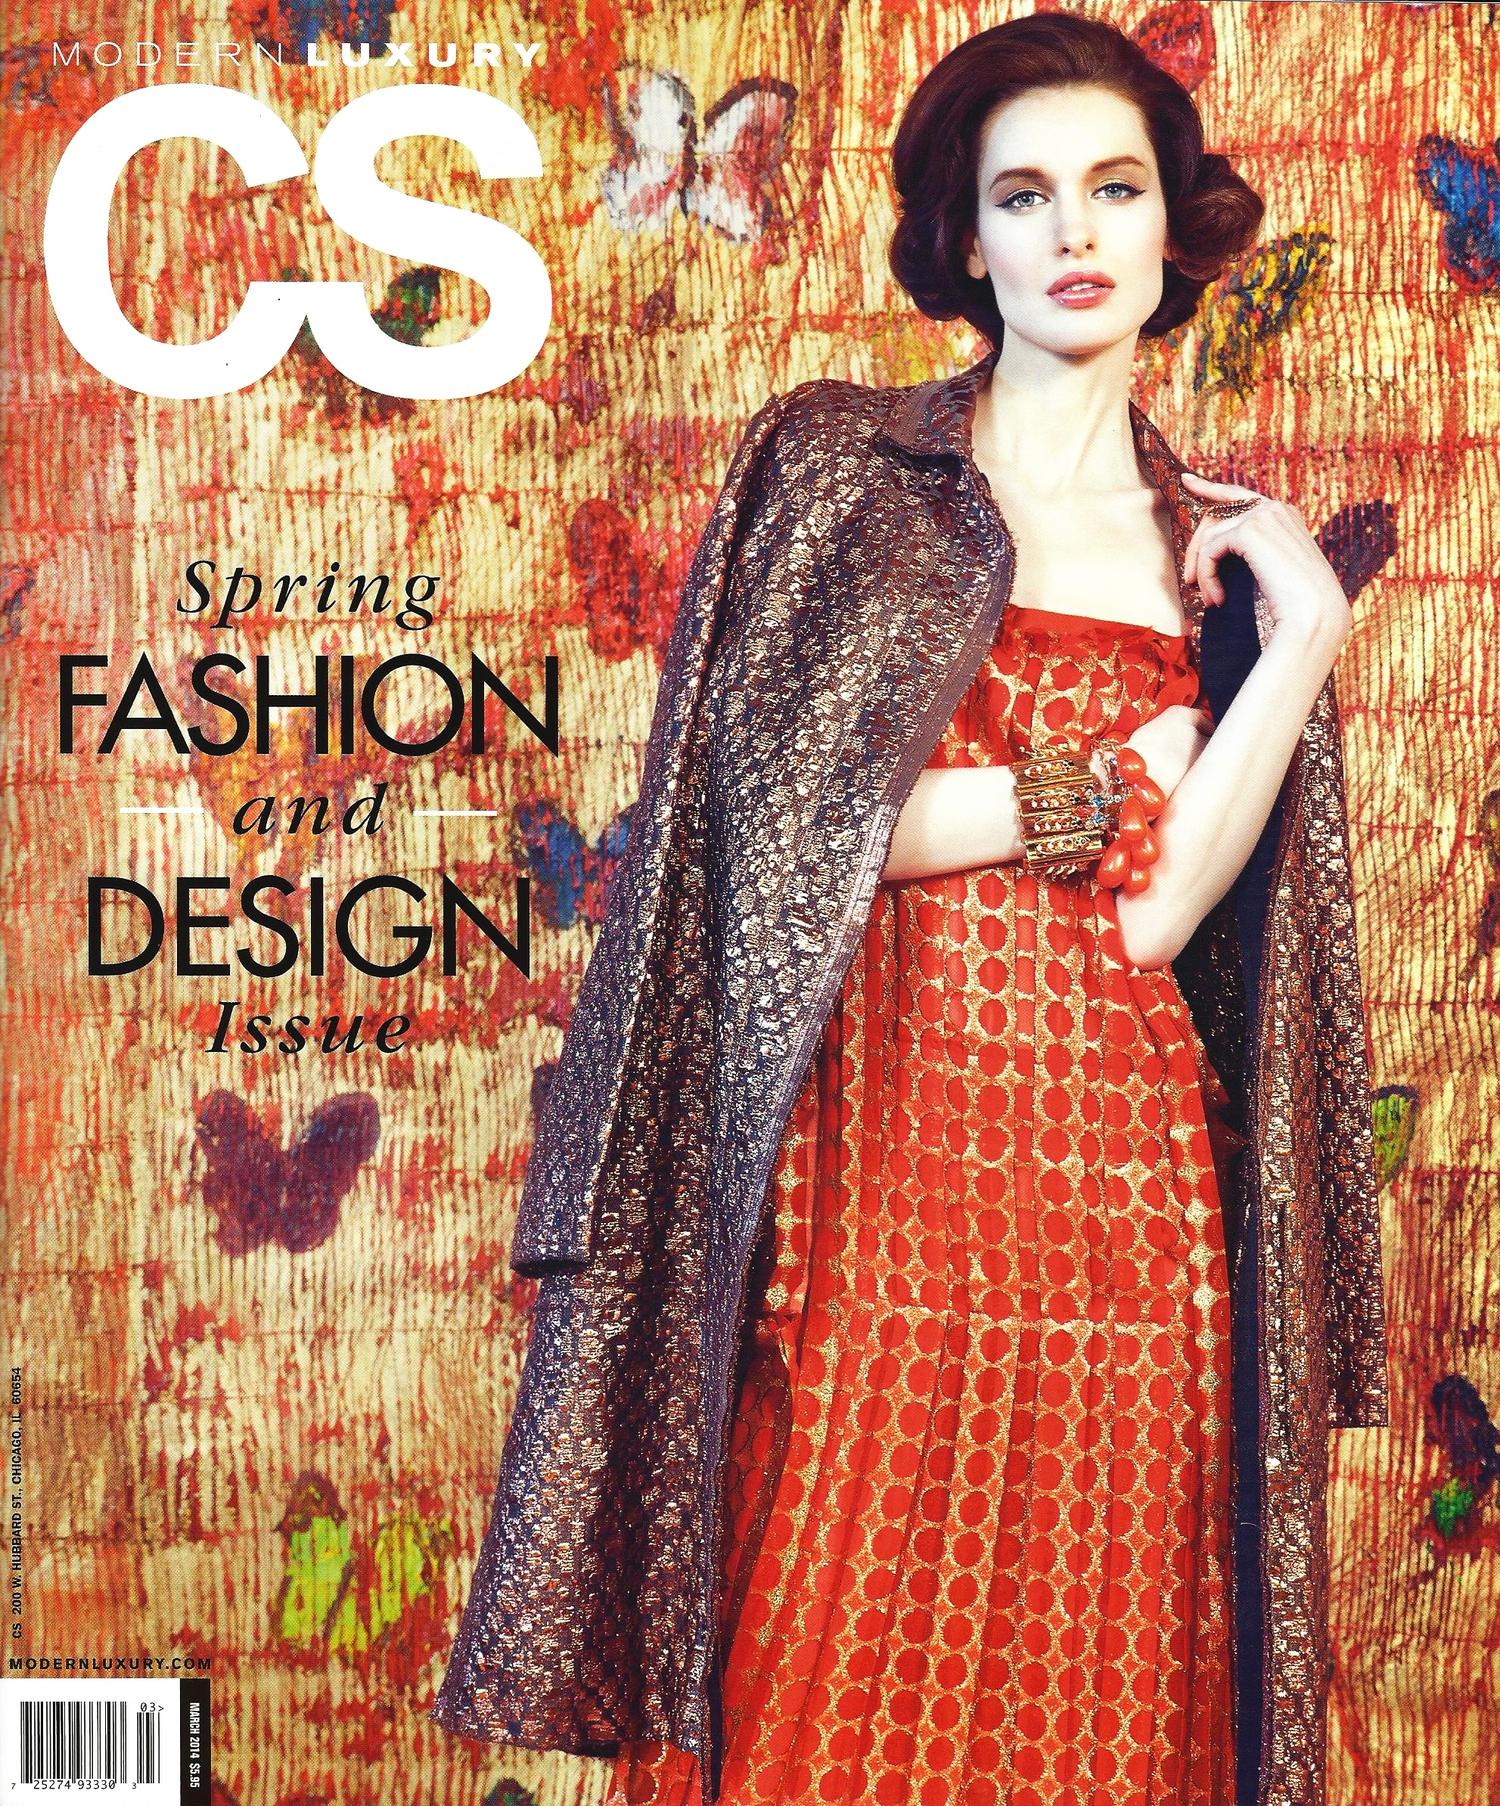 Modern Luxury CS - Spring Fashion & Design - pg 50 - 2014